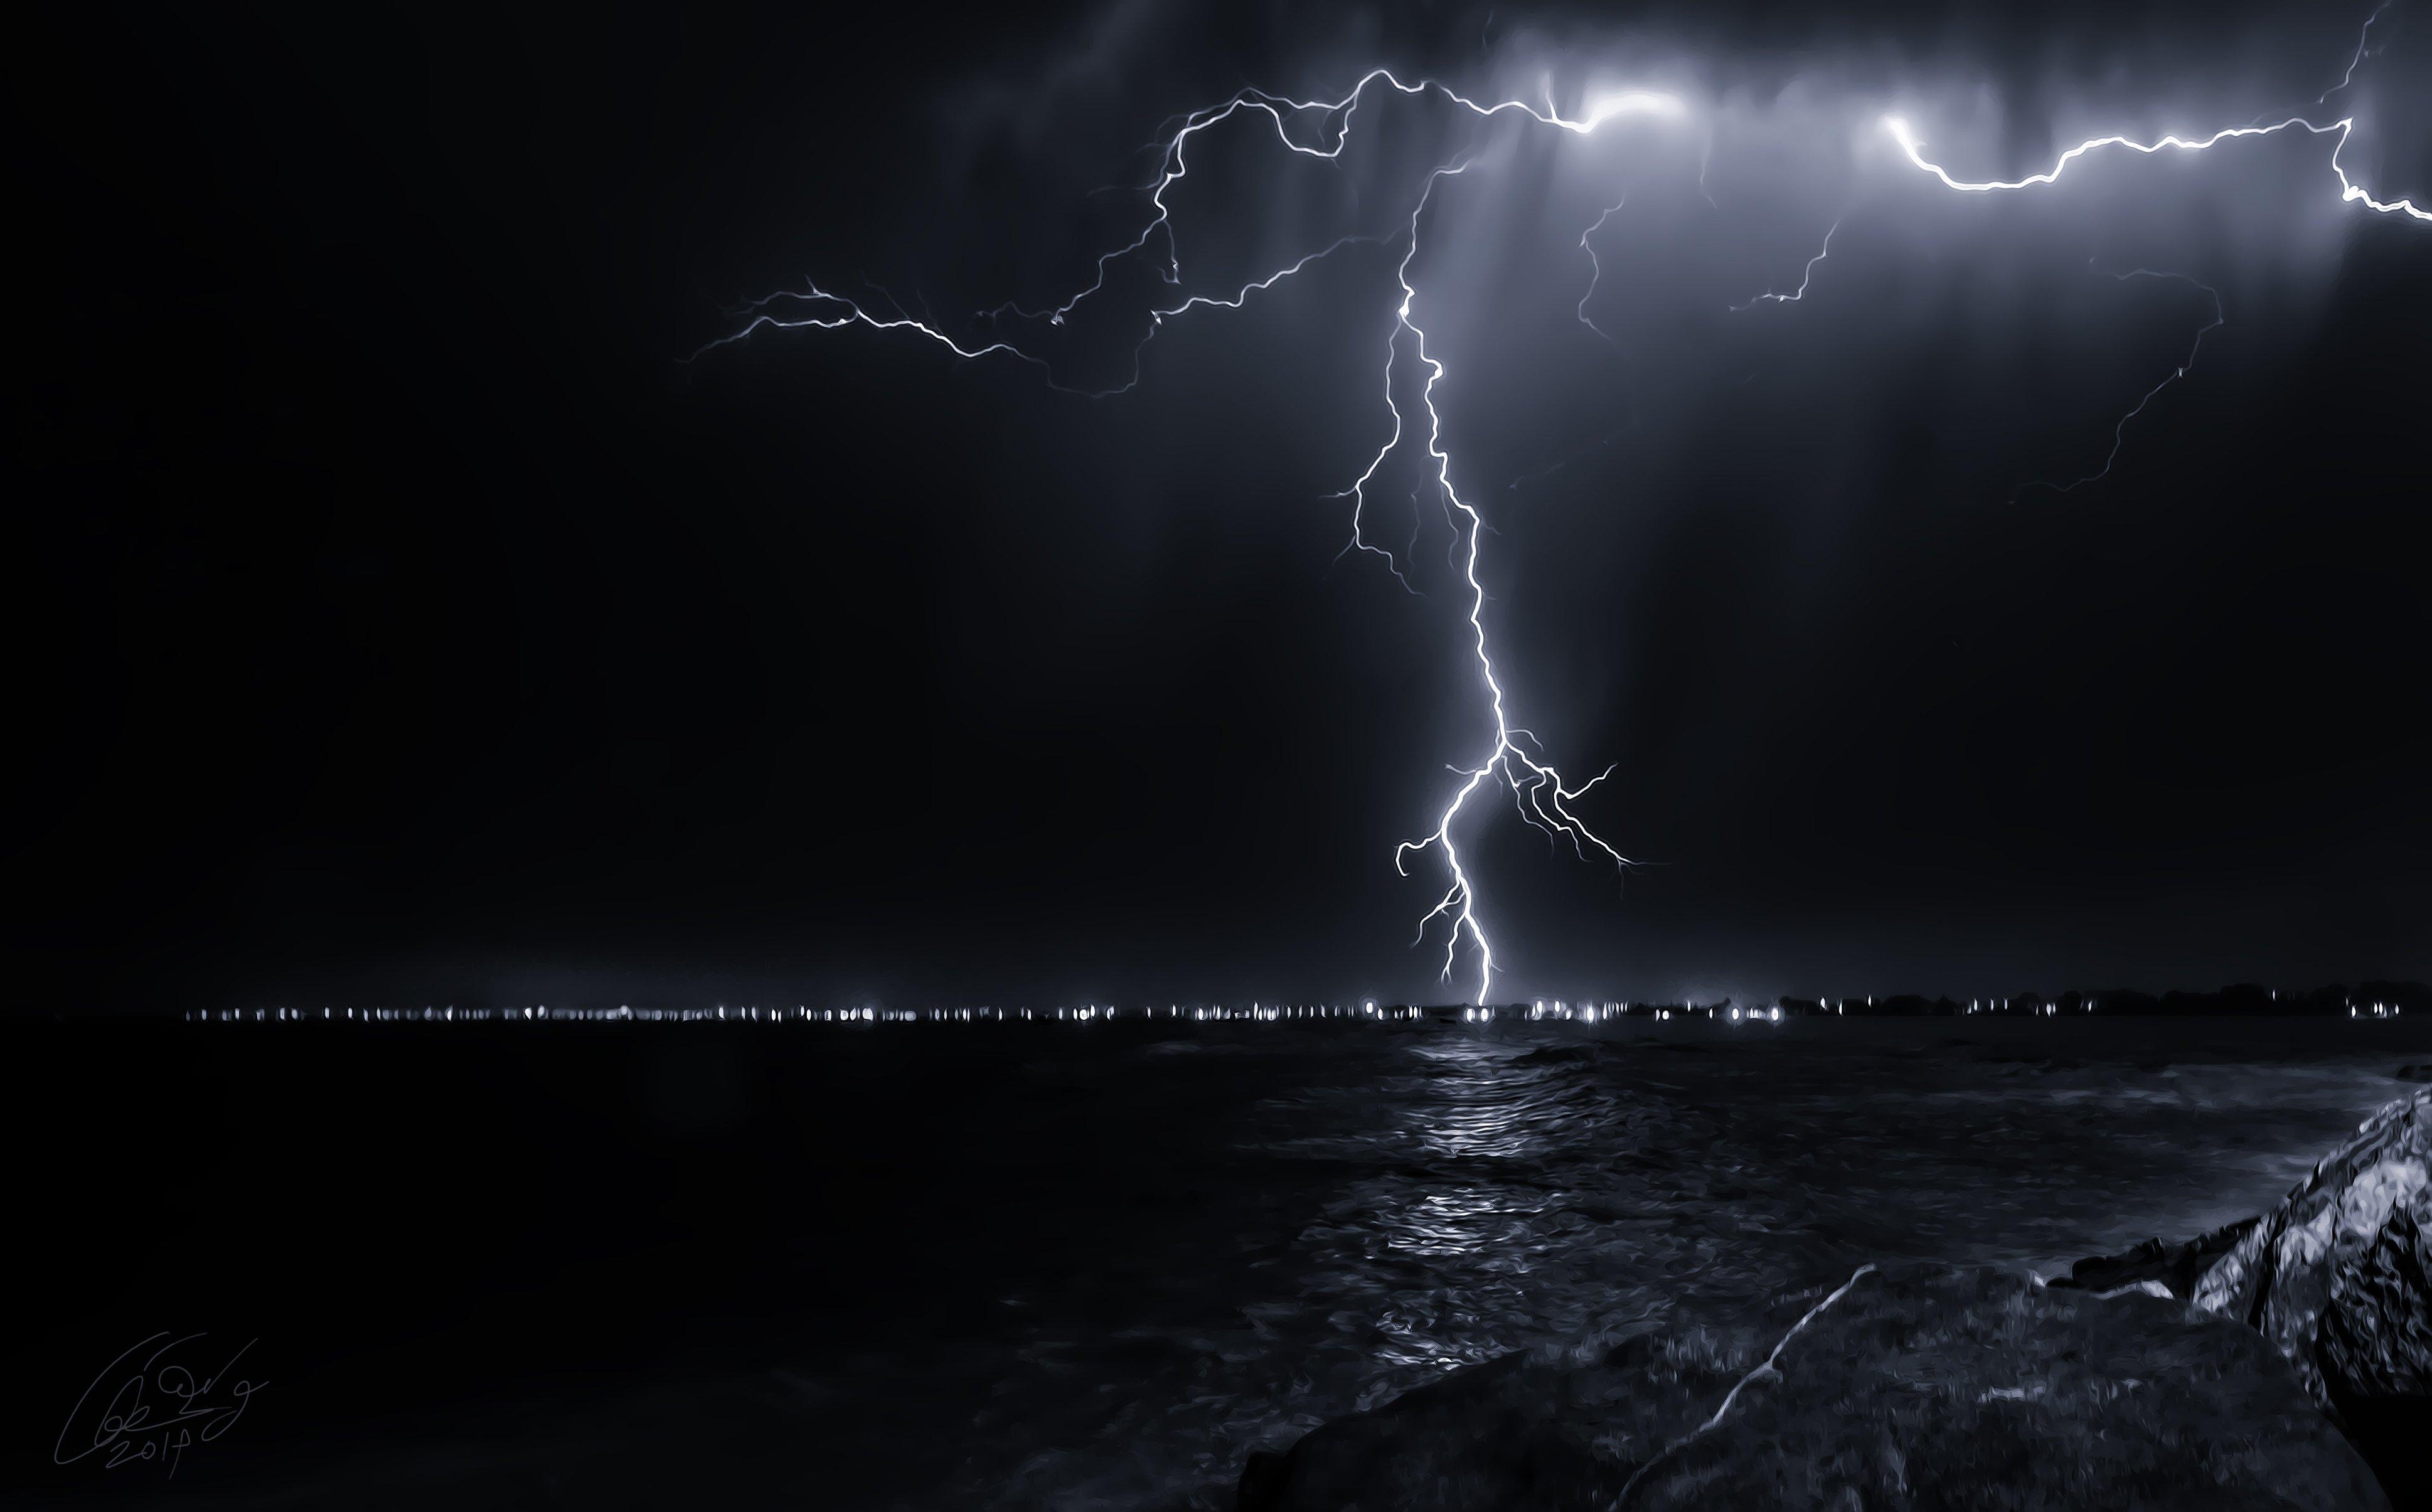 Good Night 3d Wallpapers Free Download Nature Night Sky Lightning Sea Ocean Storm Rain Wallpaper